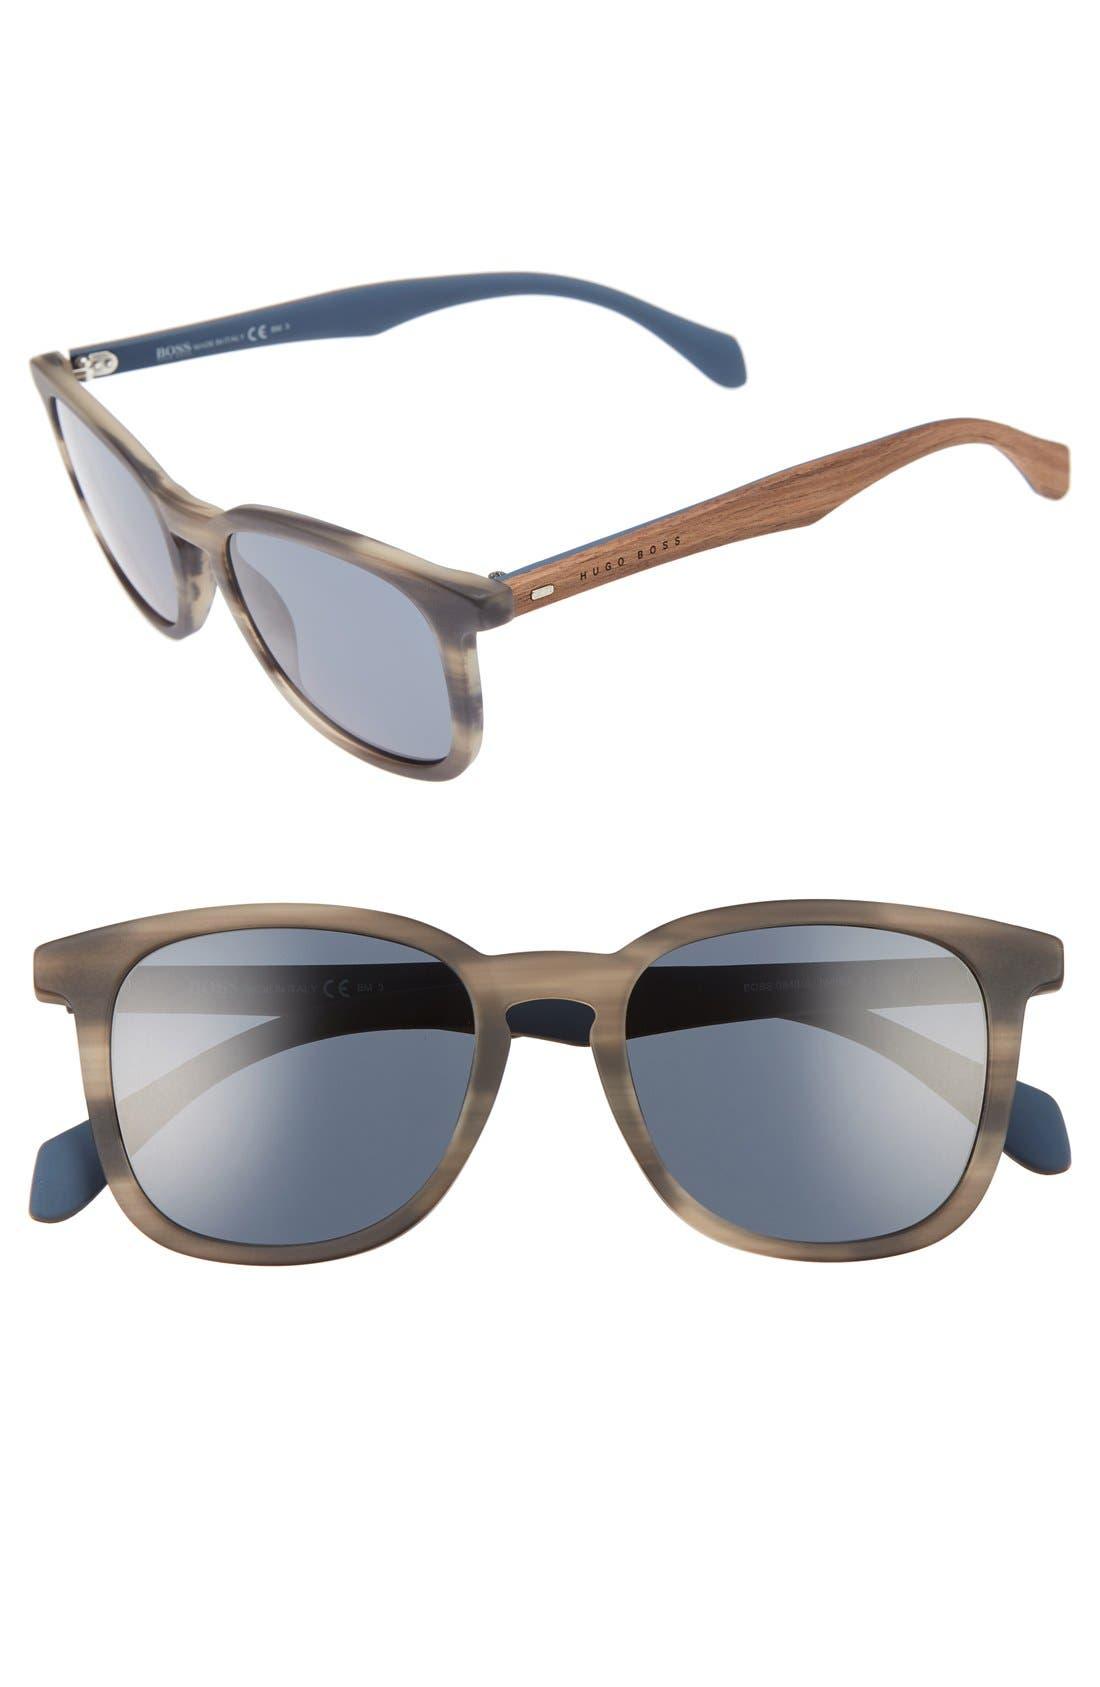 BOSS 843/S 52mm Sunglasses